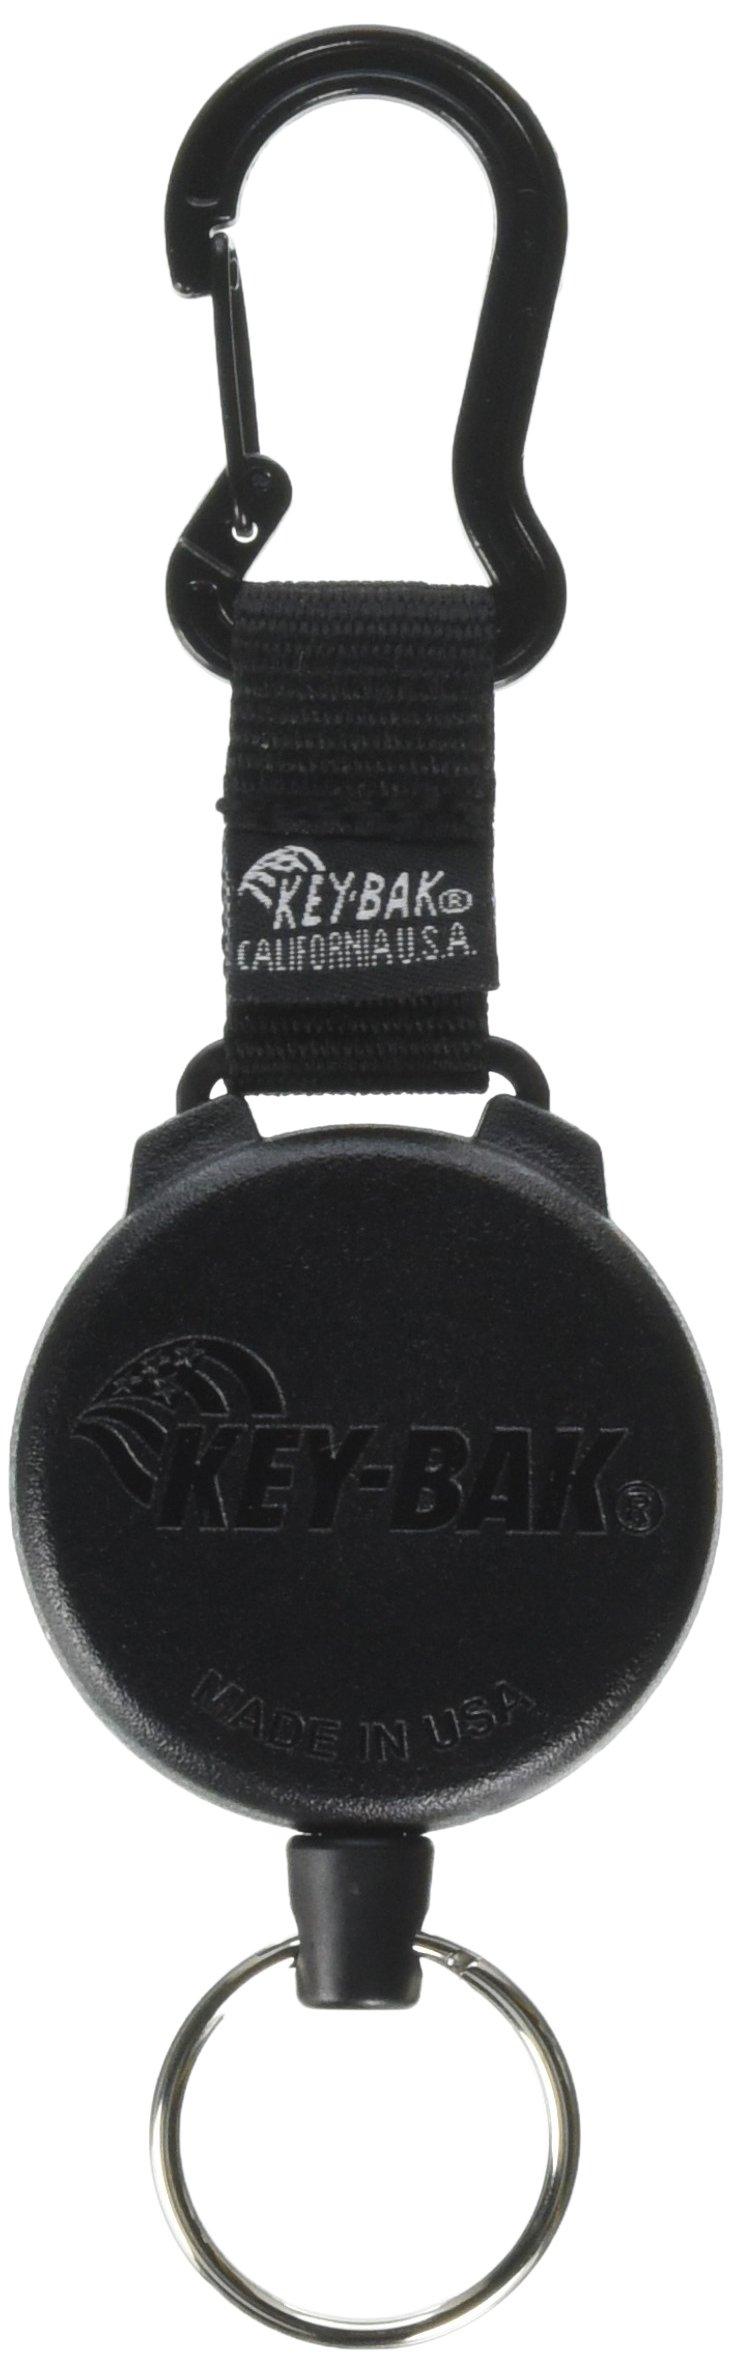 KEY-BAK 0488-803 48'' Black Carabiner Key Reel Cord